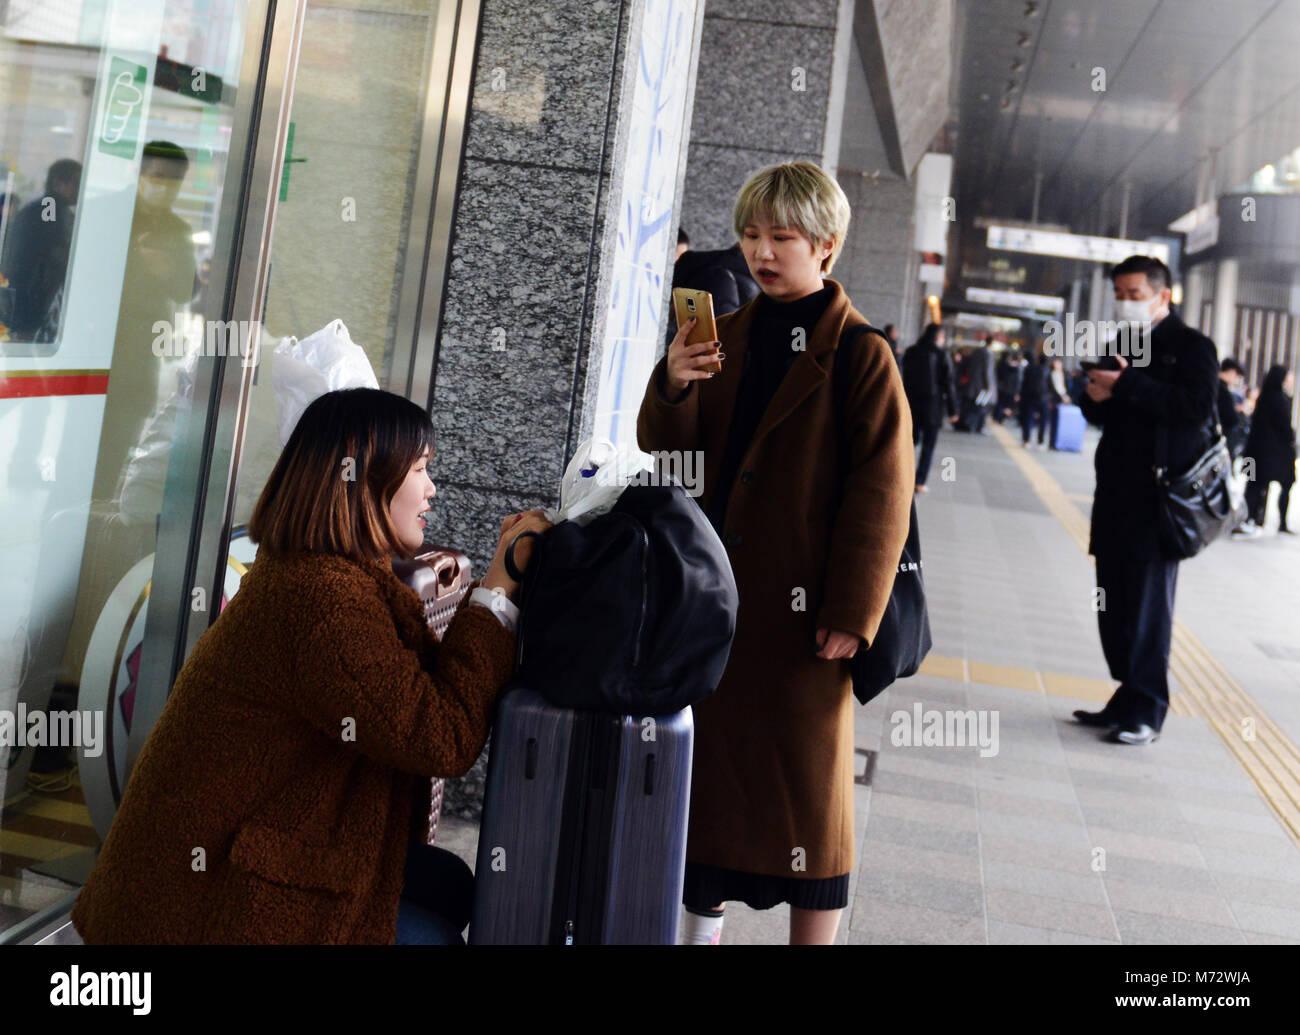 Hakata station in Fukuoka, Japan. - Stock Image